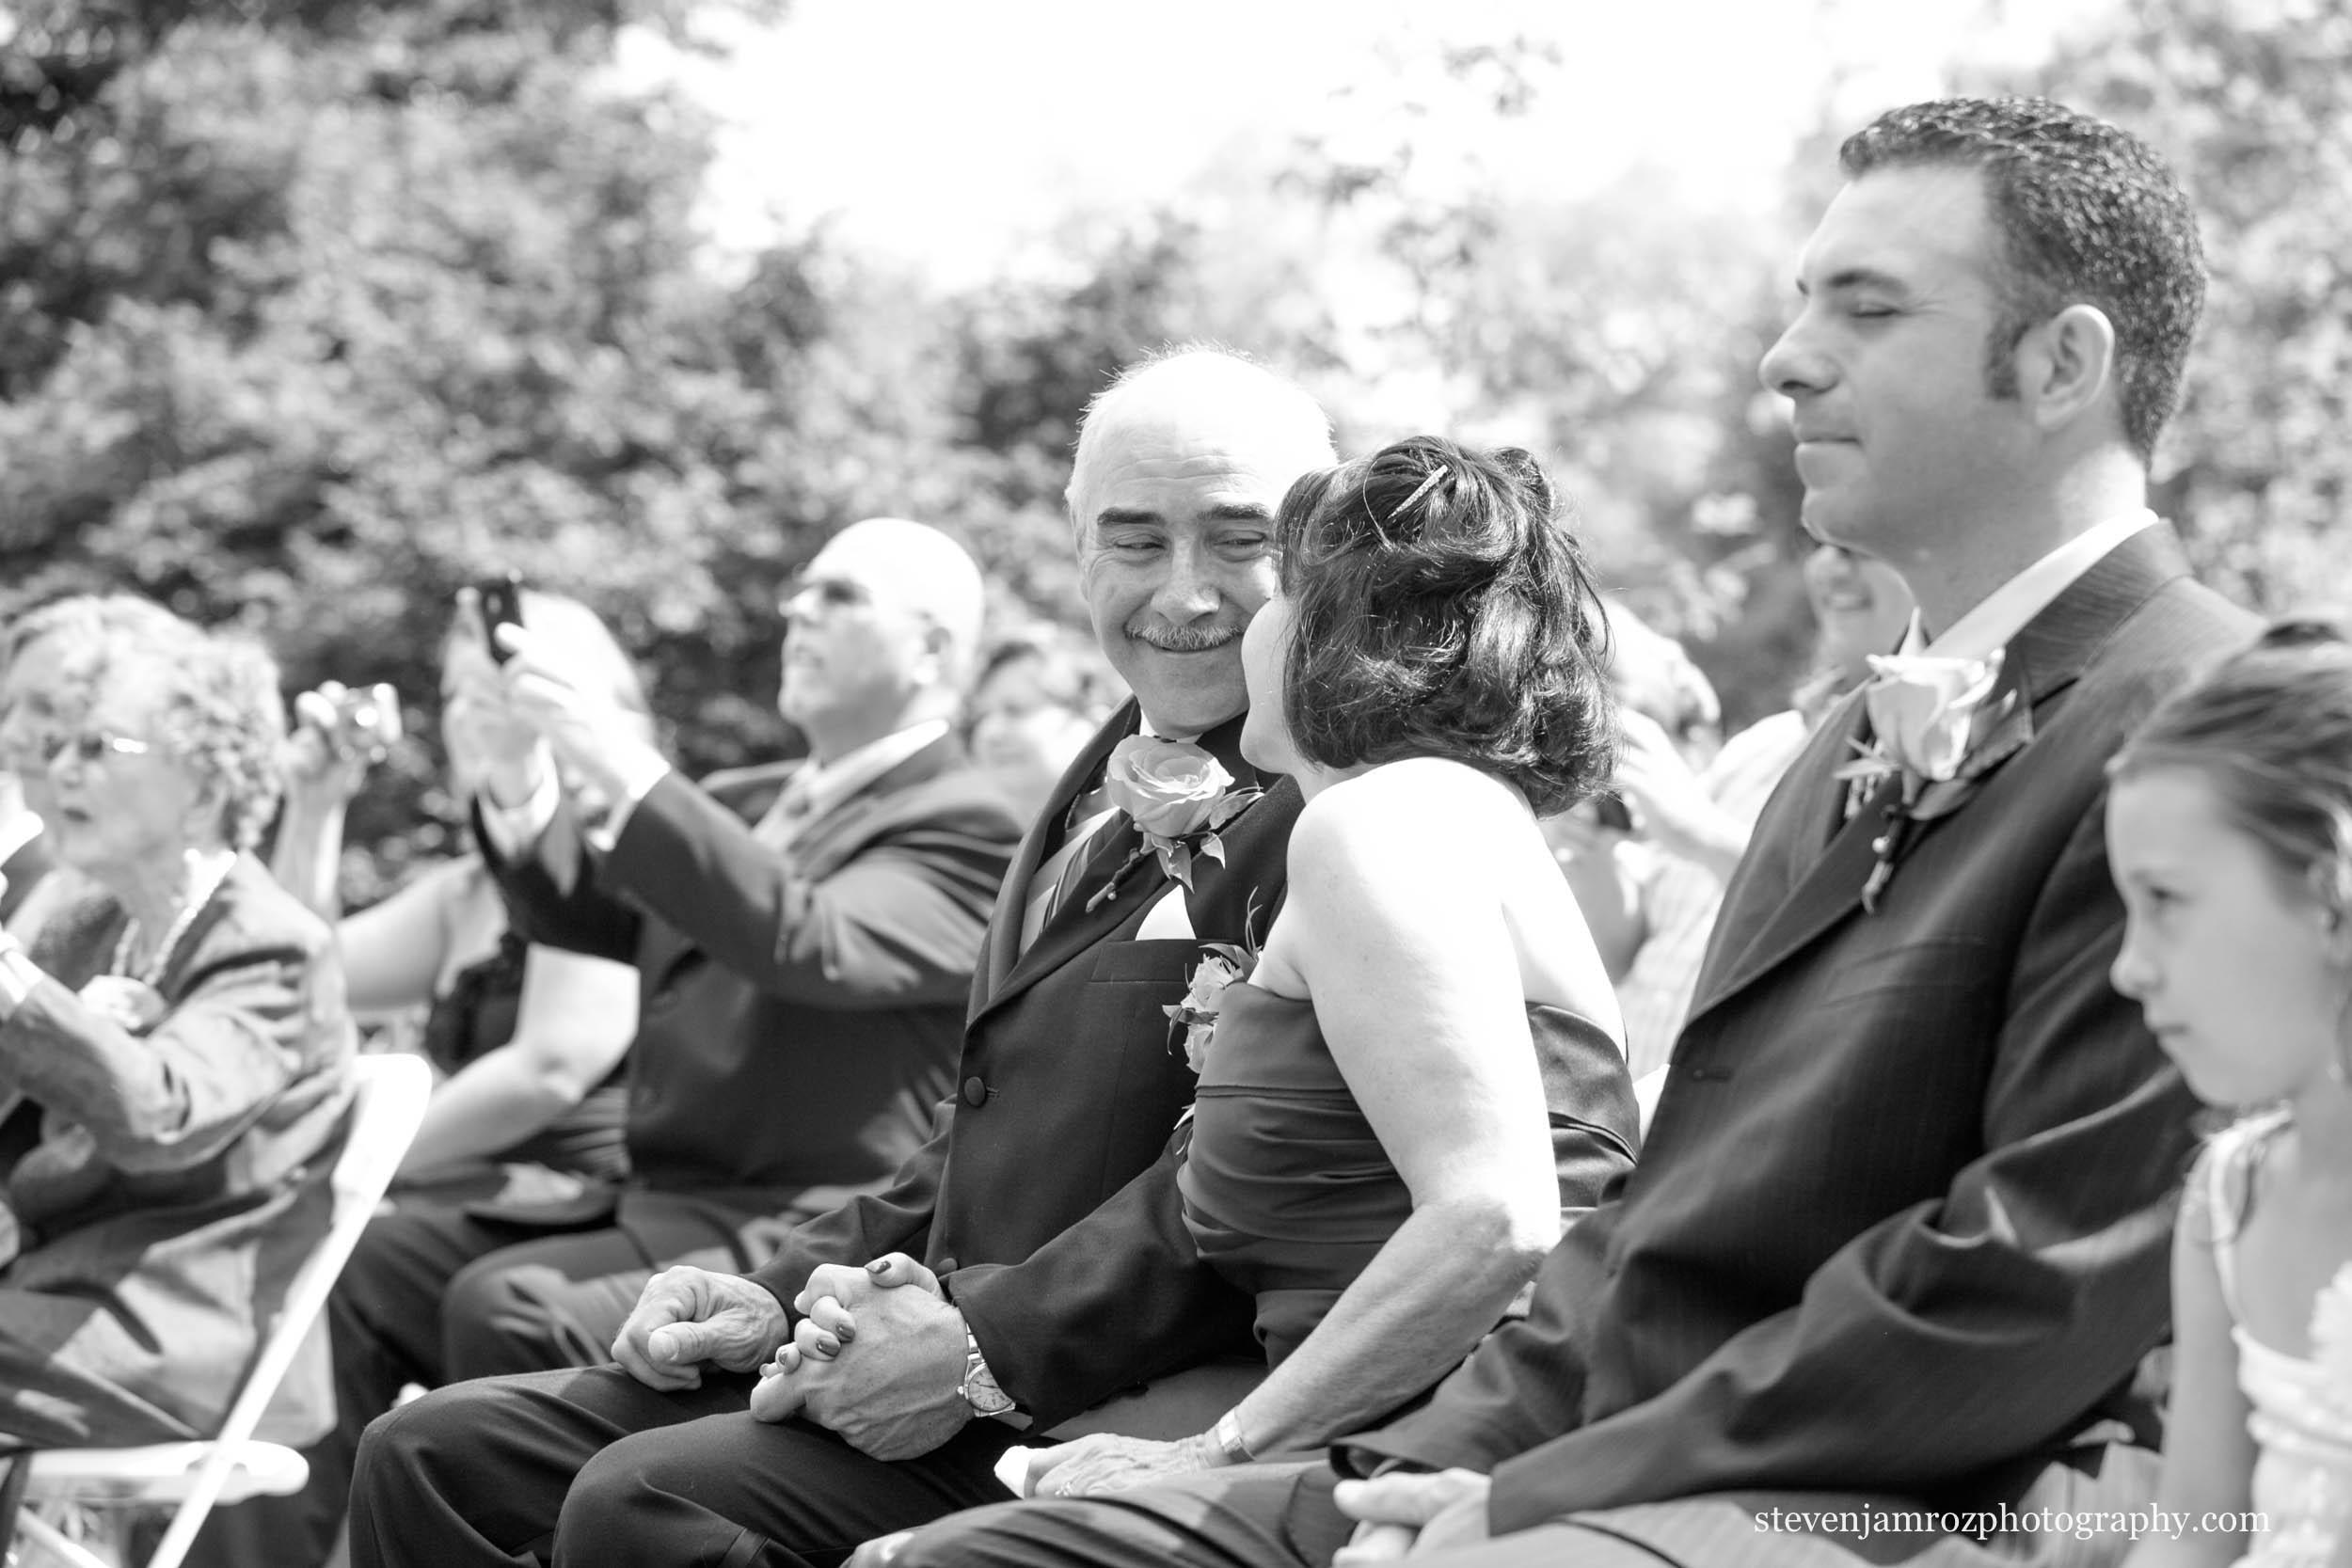 fred-fletcher-park-wedding-ceremony-parent-nc-steven-jamroz-photography-0360.jpg